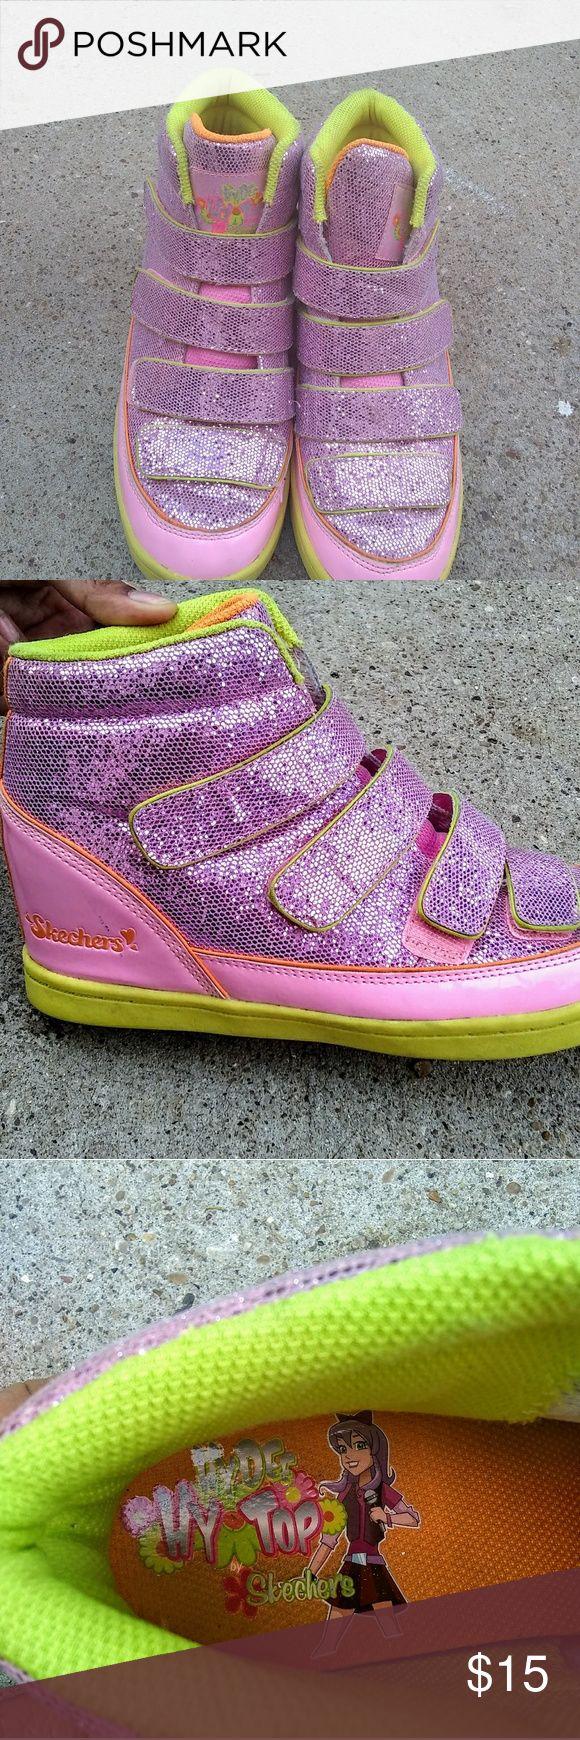 Sketchers hytop shoes Pretty girls hytop wedge sneakers Skechers Shoes Sneakers